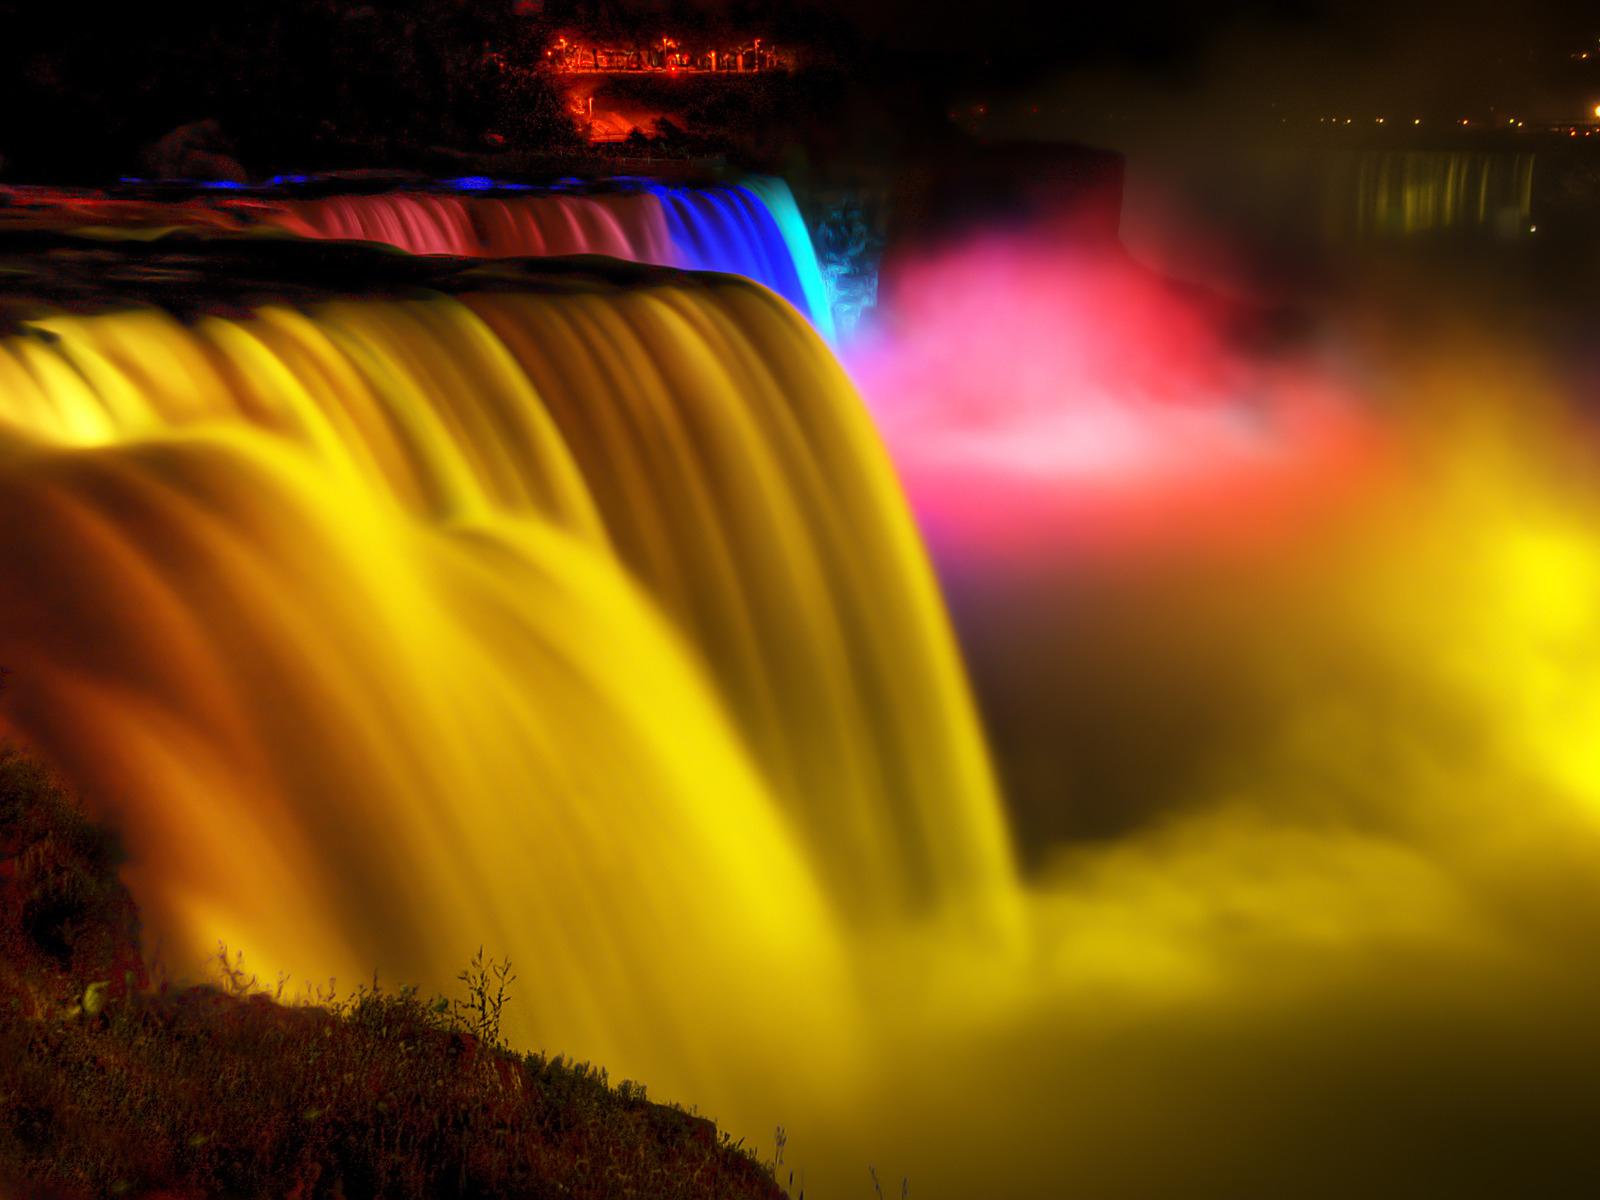 Niagara-Falls_night_travel_Niagara-Falls_trip_hottrip-net2